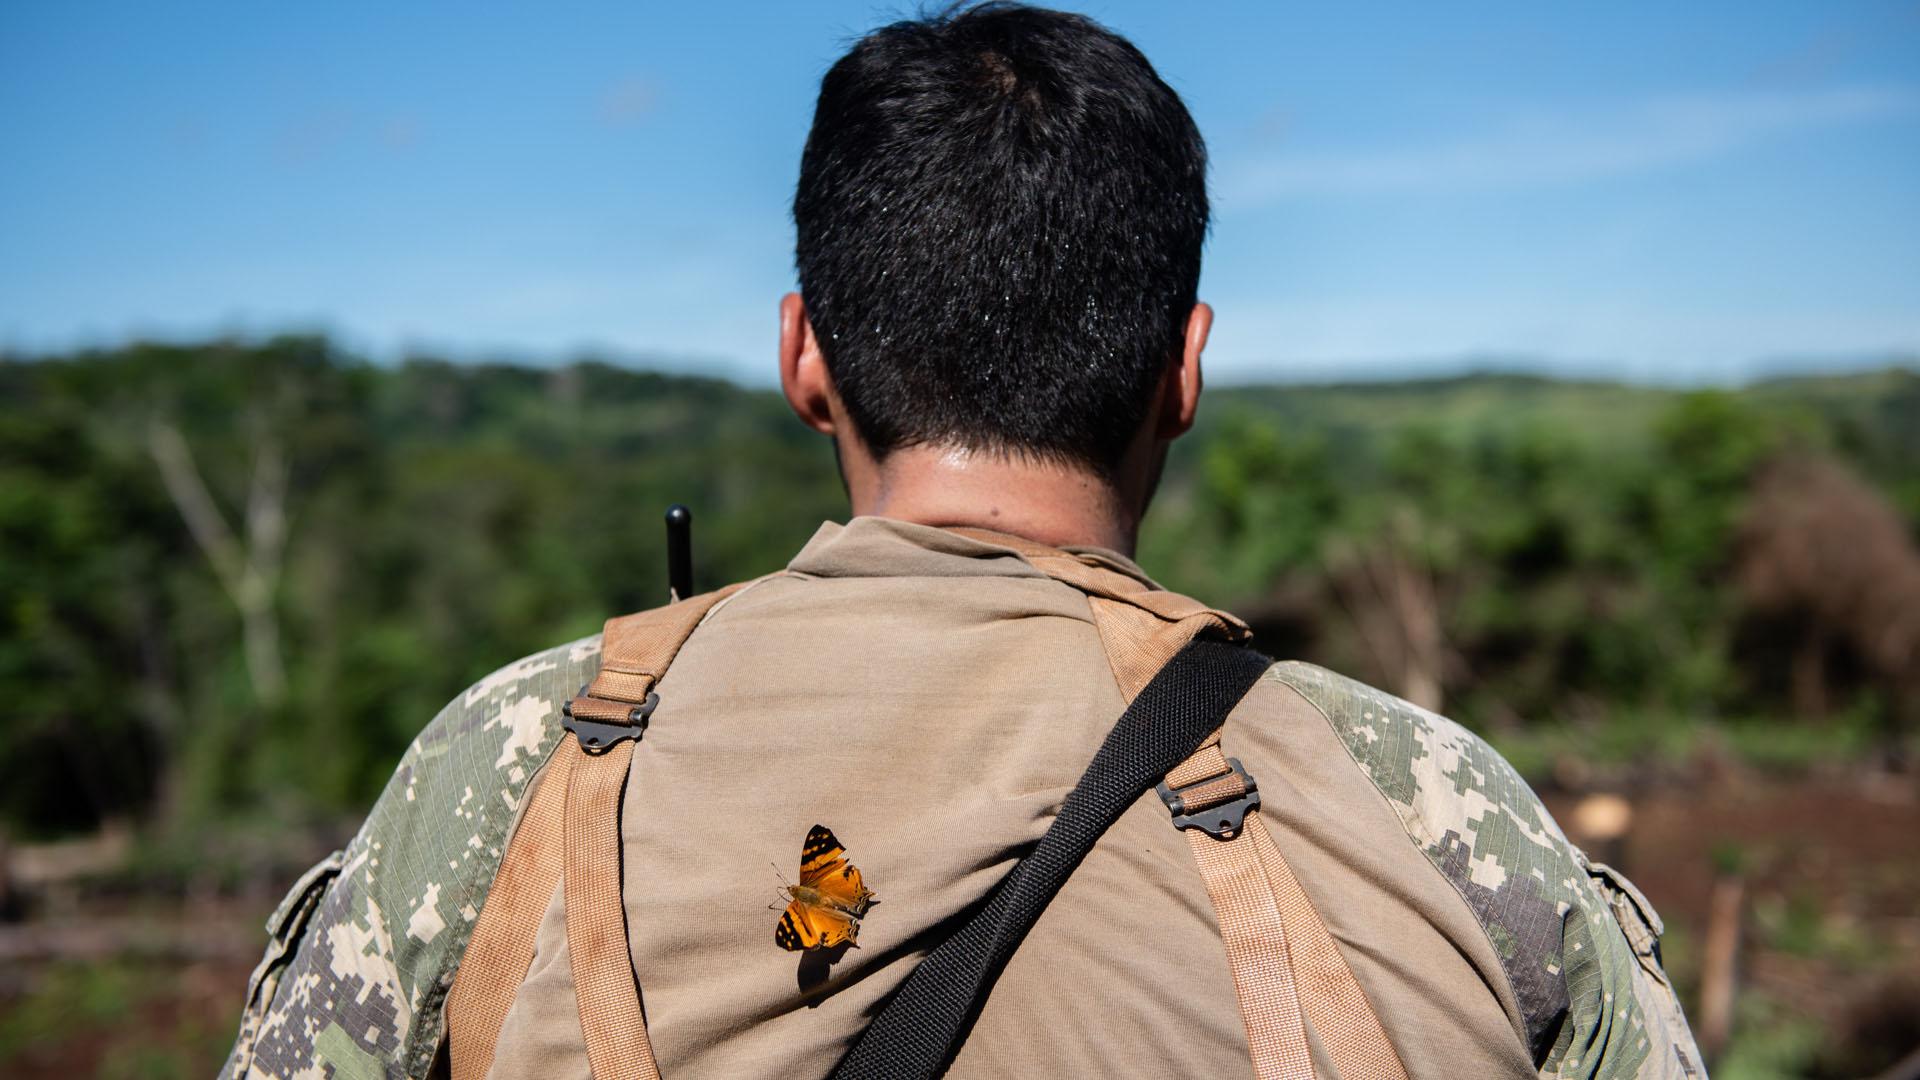 Las mariposas son una figura común en la espesura.